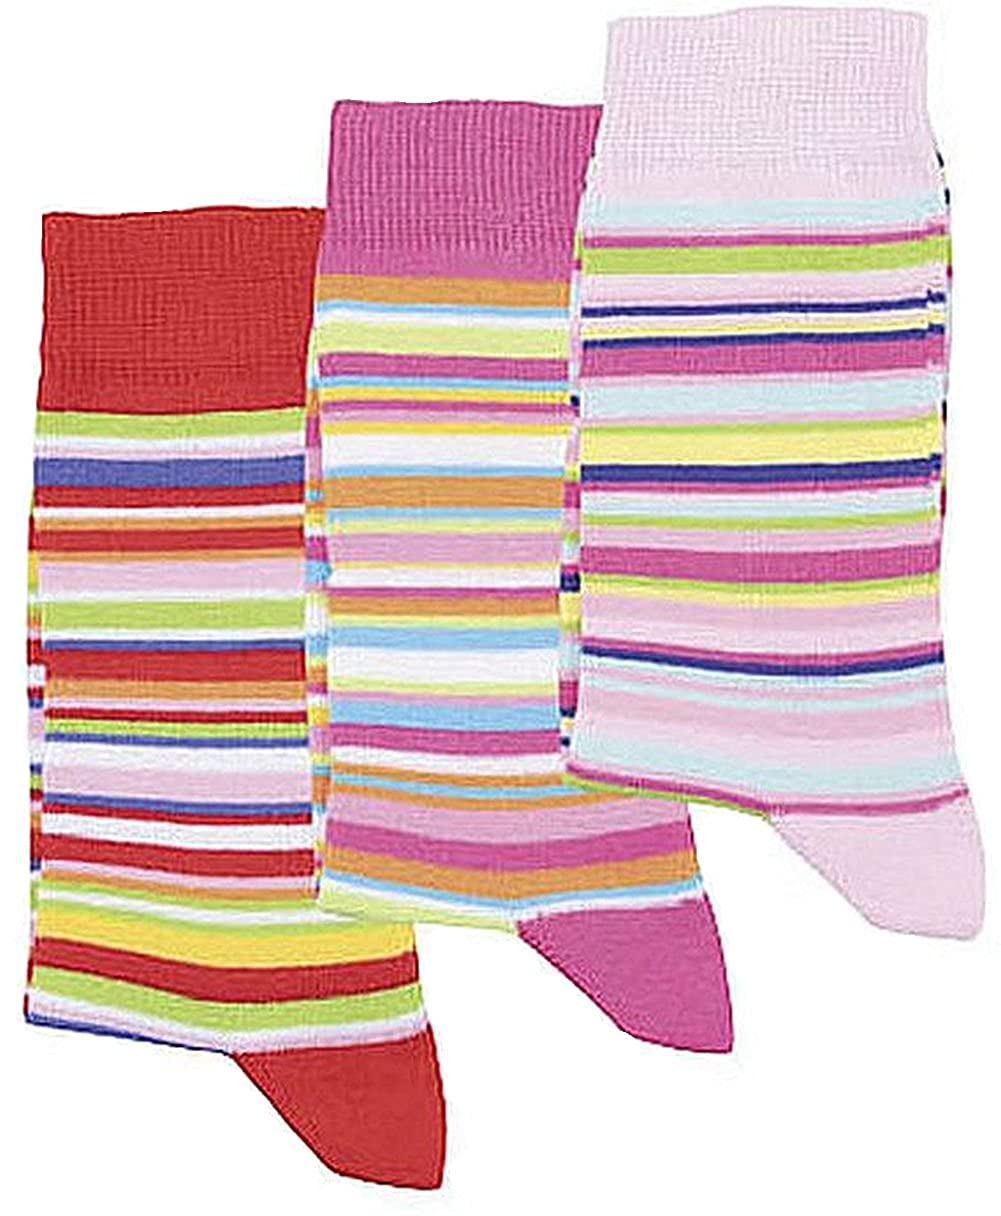 3 PACK calze calzini per bambini